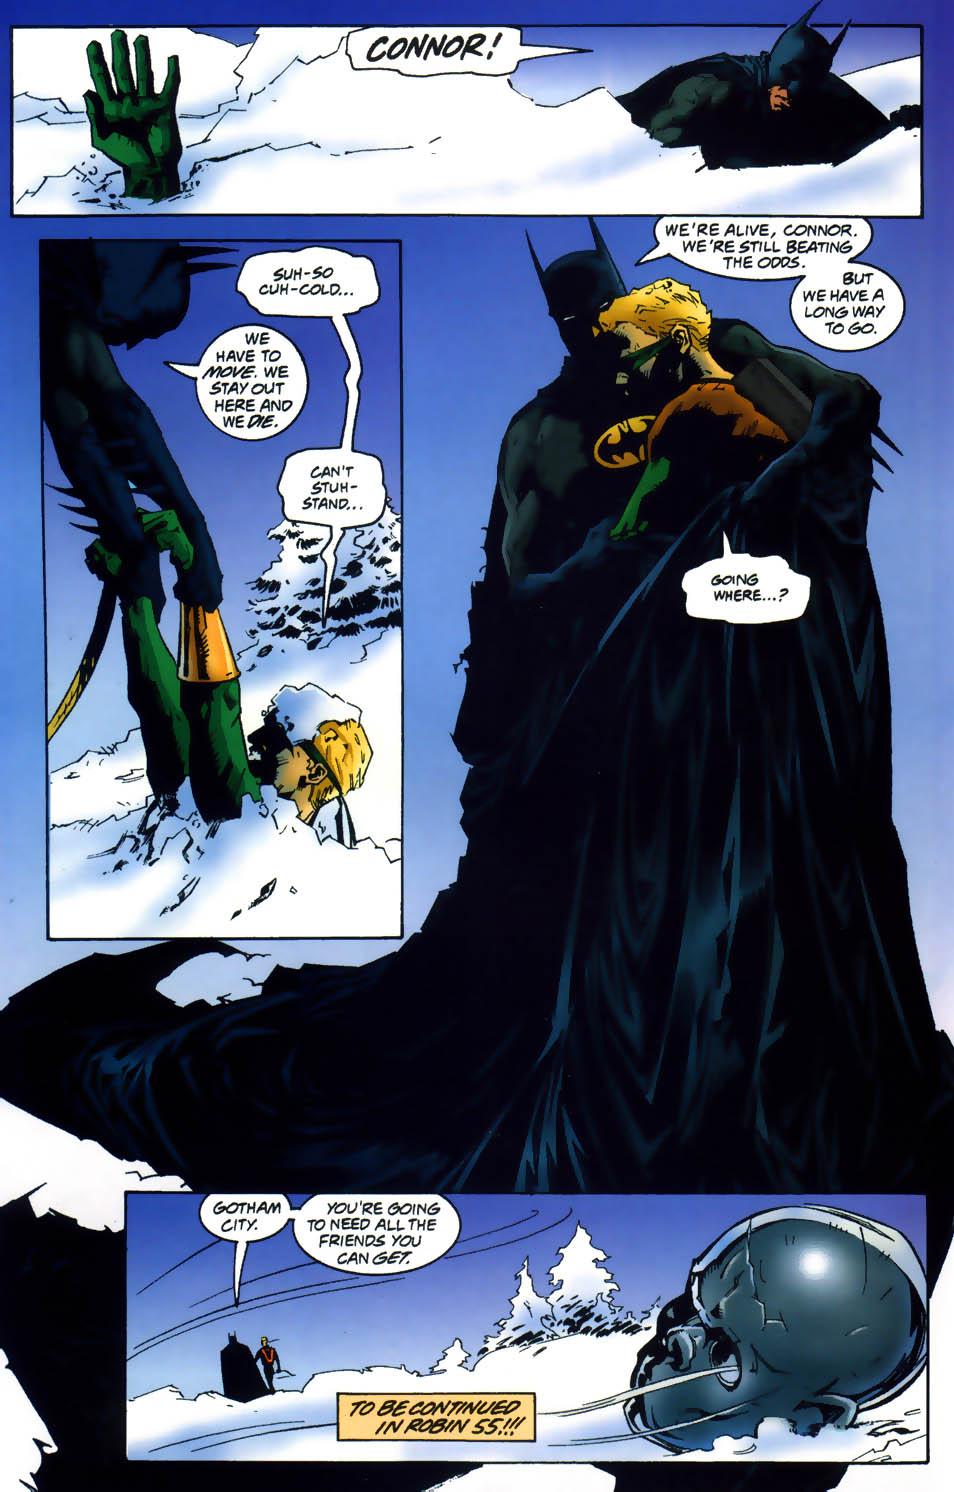 Detective Comics 723 pg22 Batman ConnorHawke.jpg